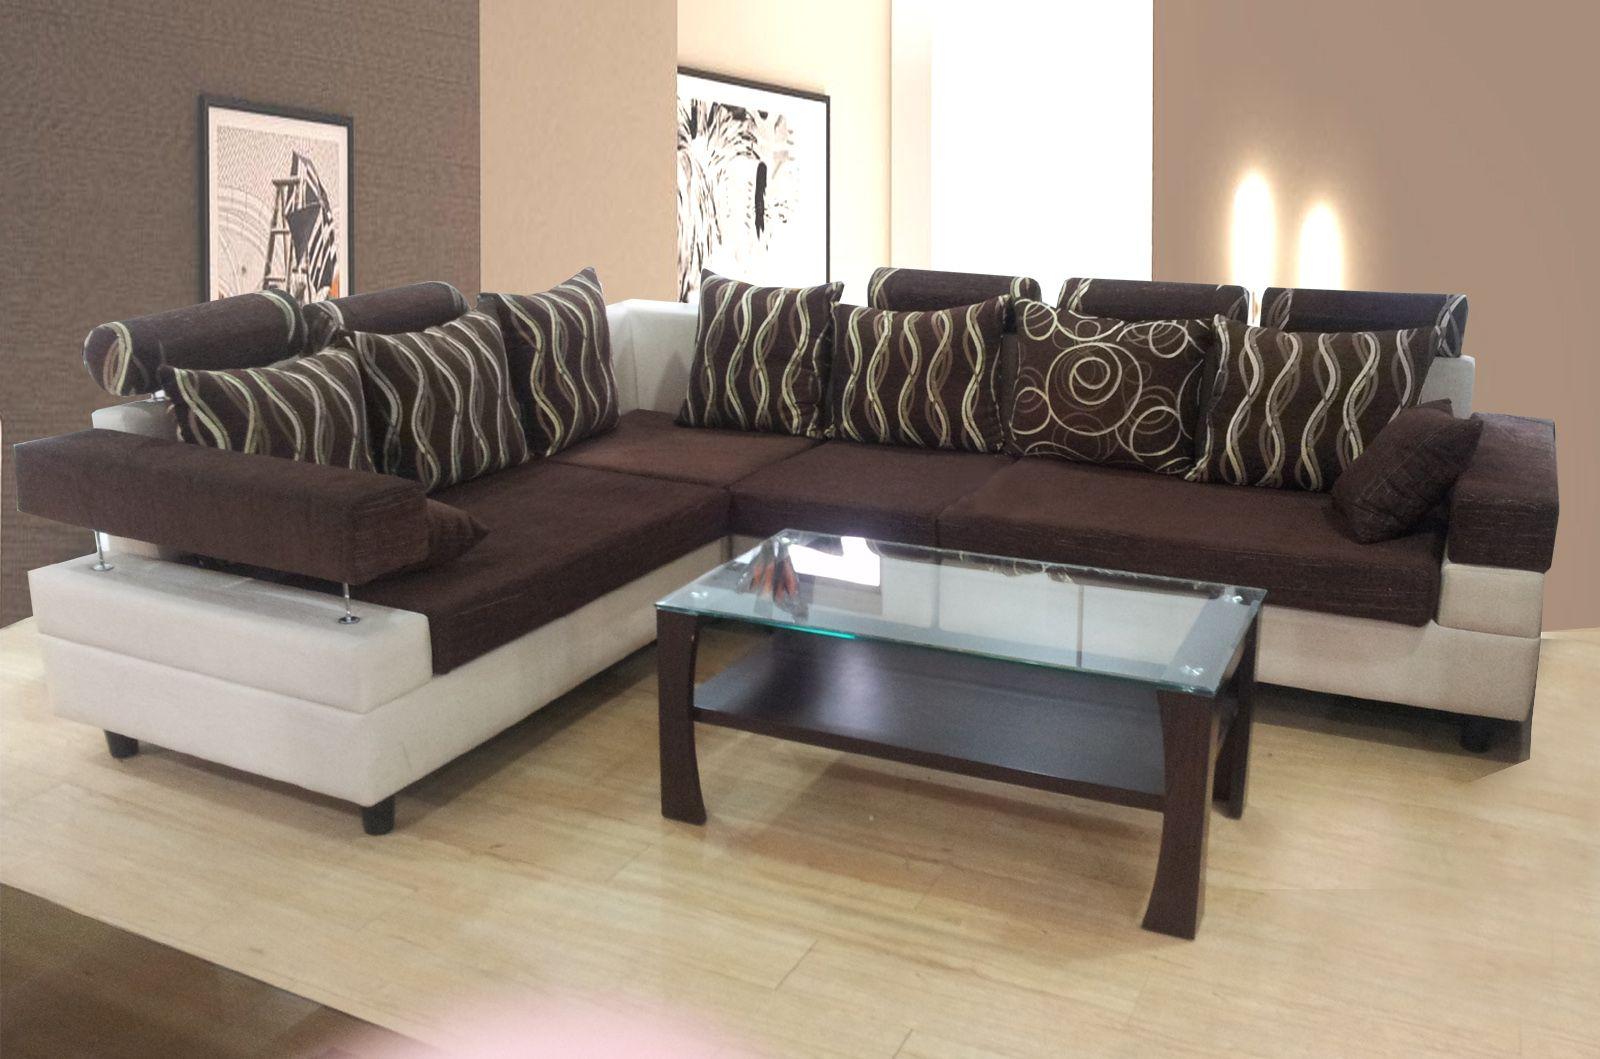 best sofa set affordable and good quality nairobi sofa set designs. more here  http://nairobisofasets.blogspot.com/ CXMWCOF